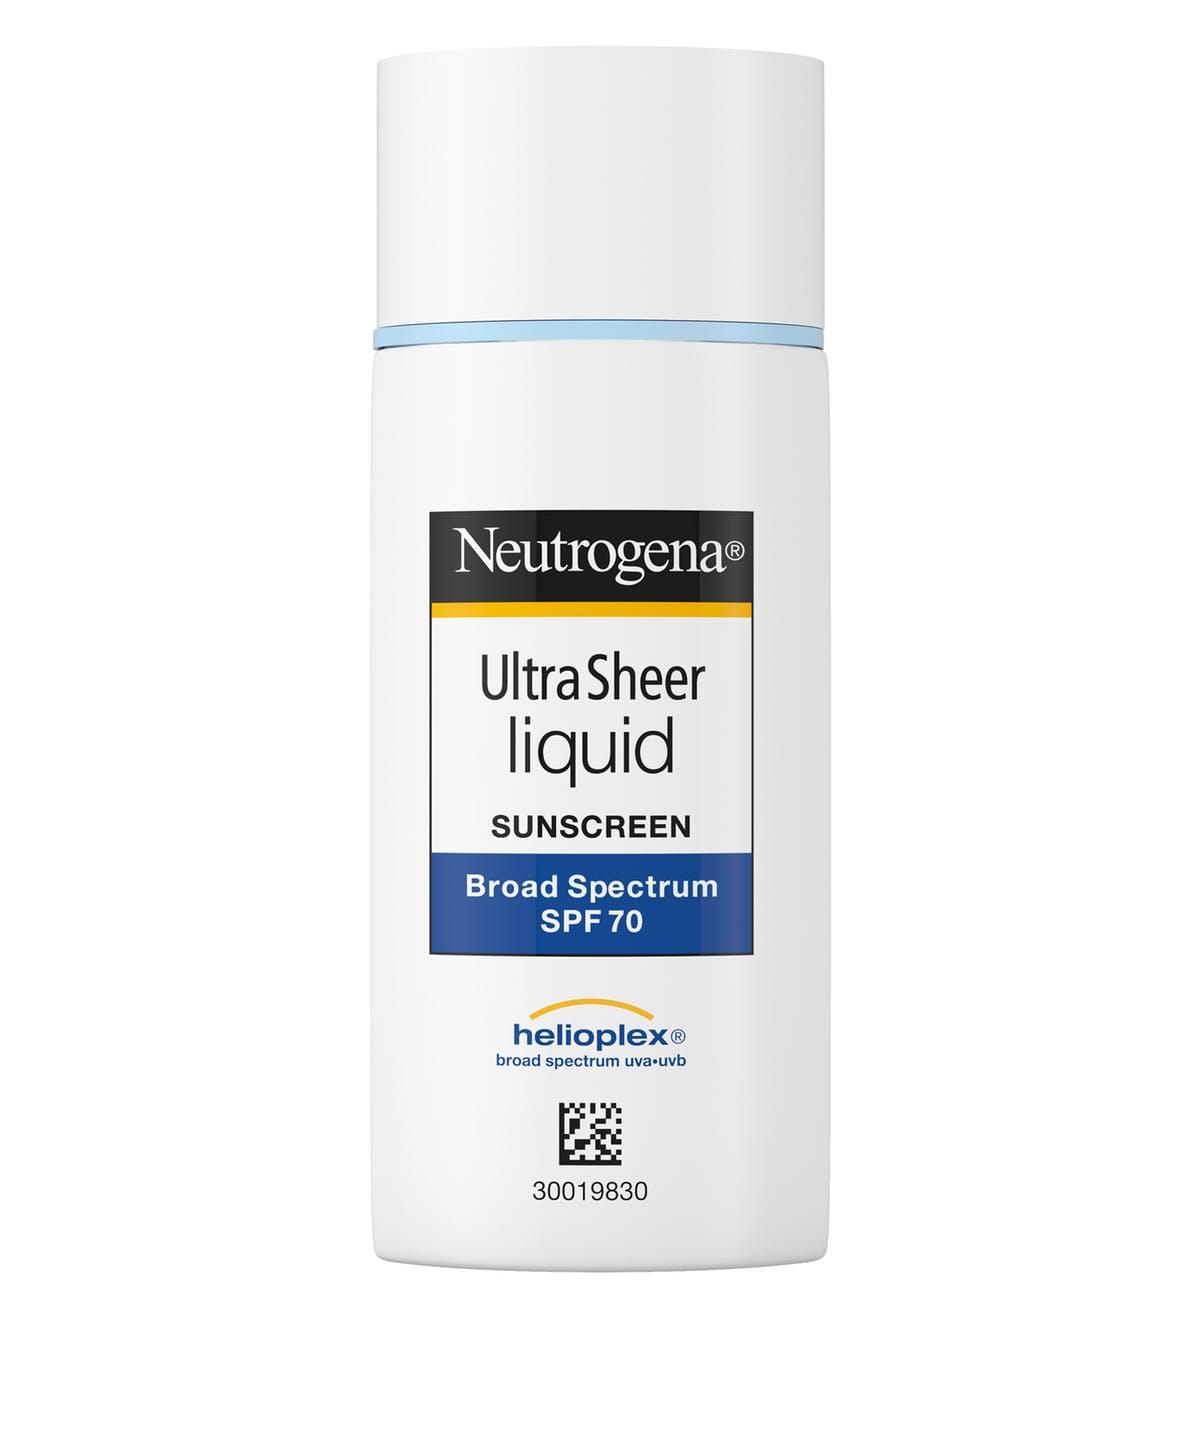 Neutrogena Ultra Sheer® Liquid Sunscreen Broad Spectrum Spf 70